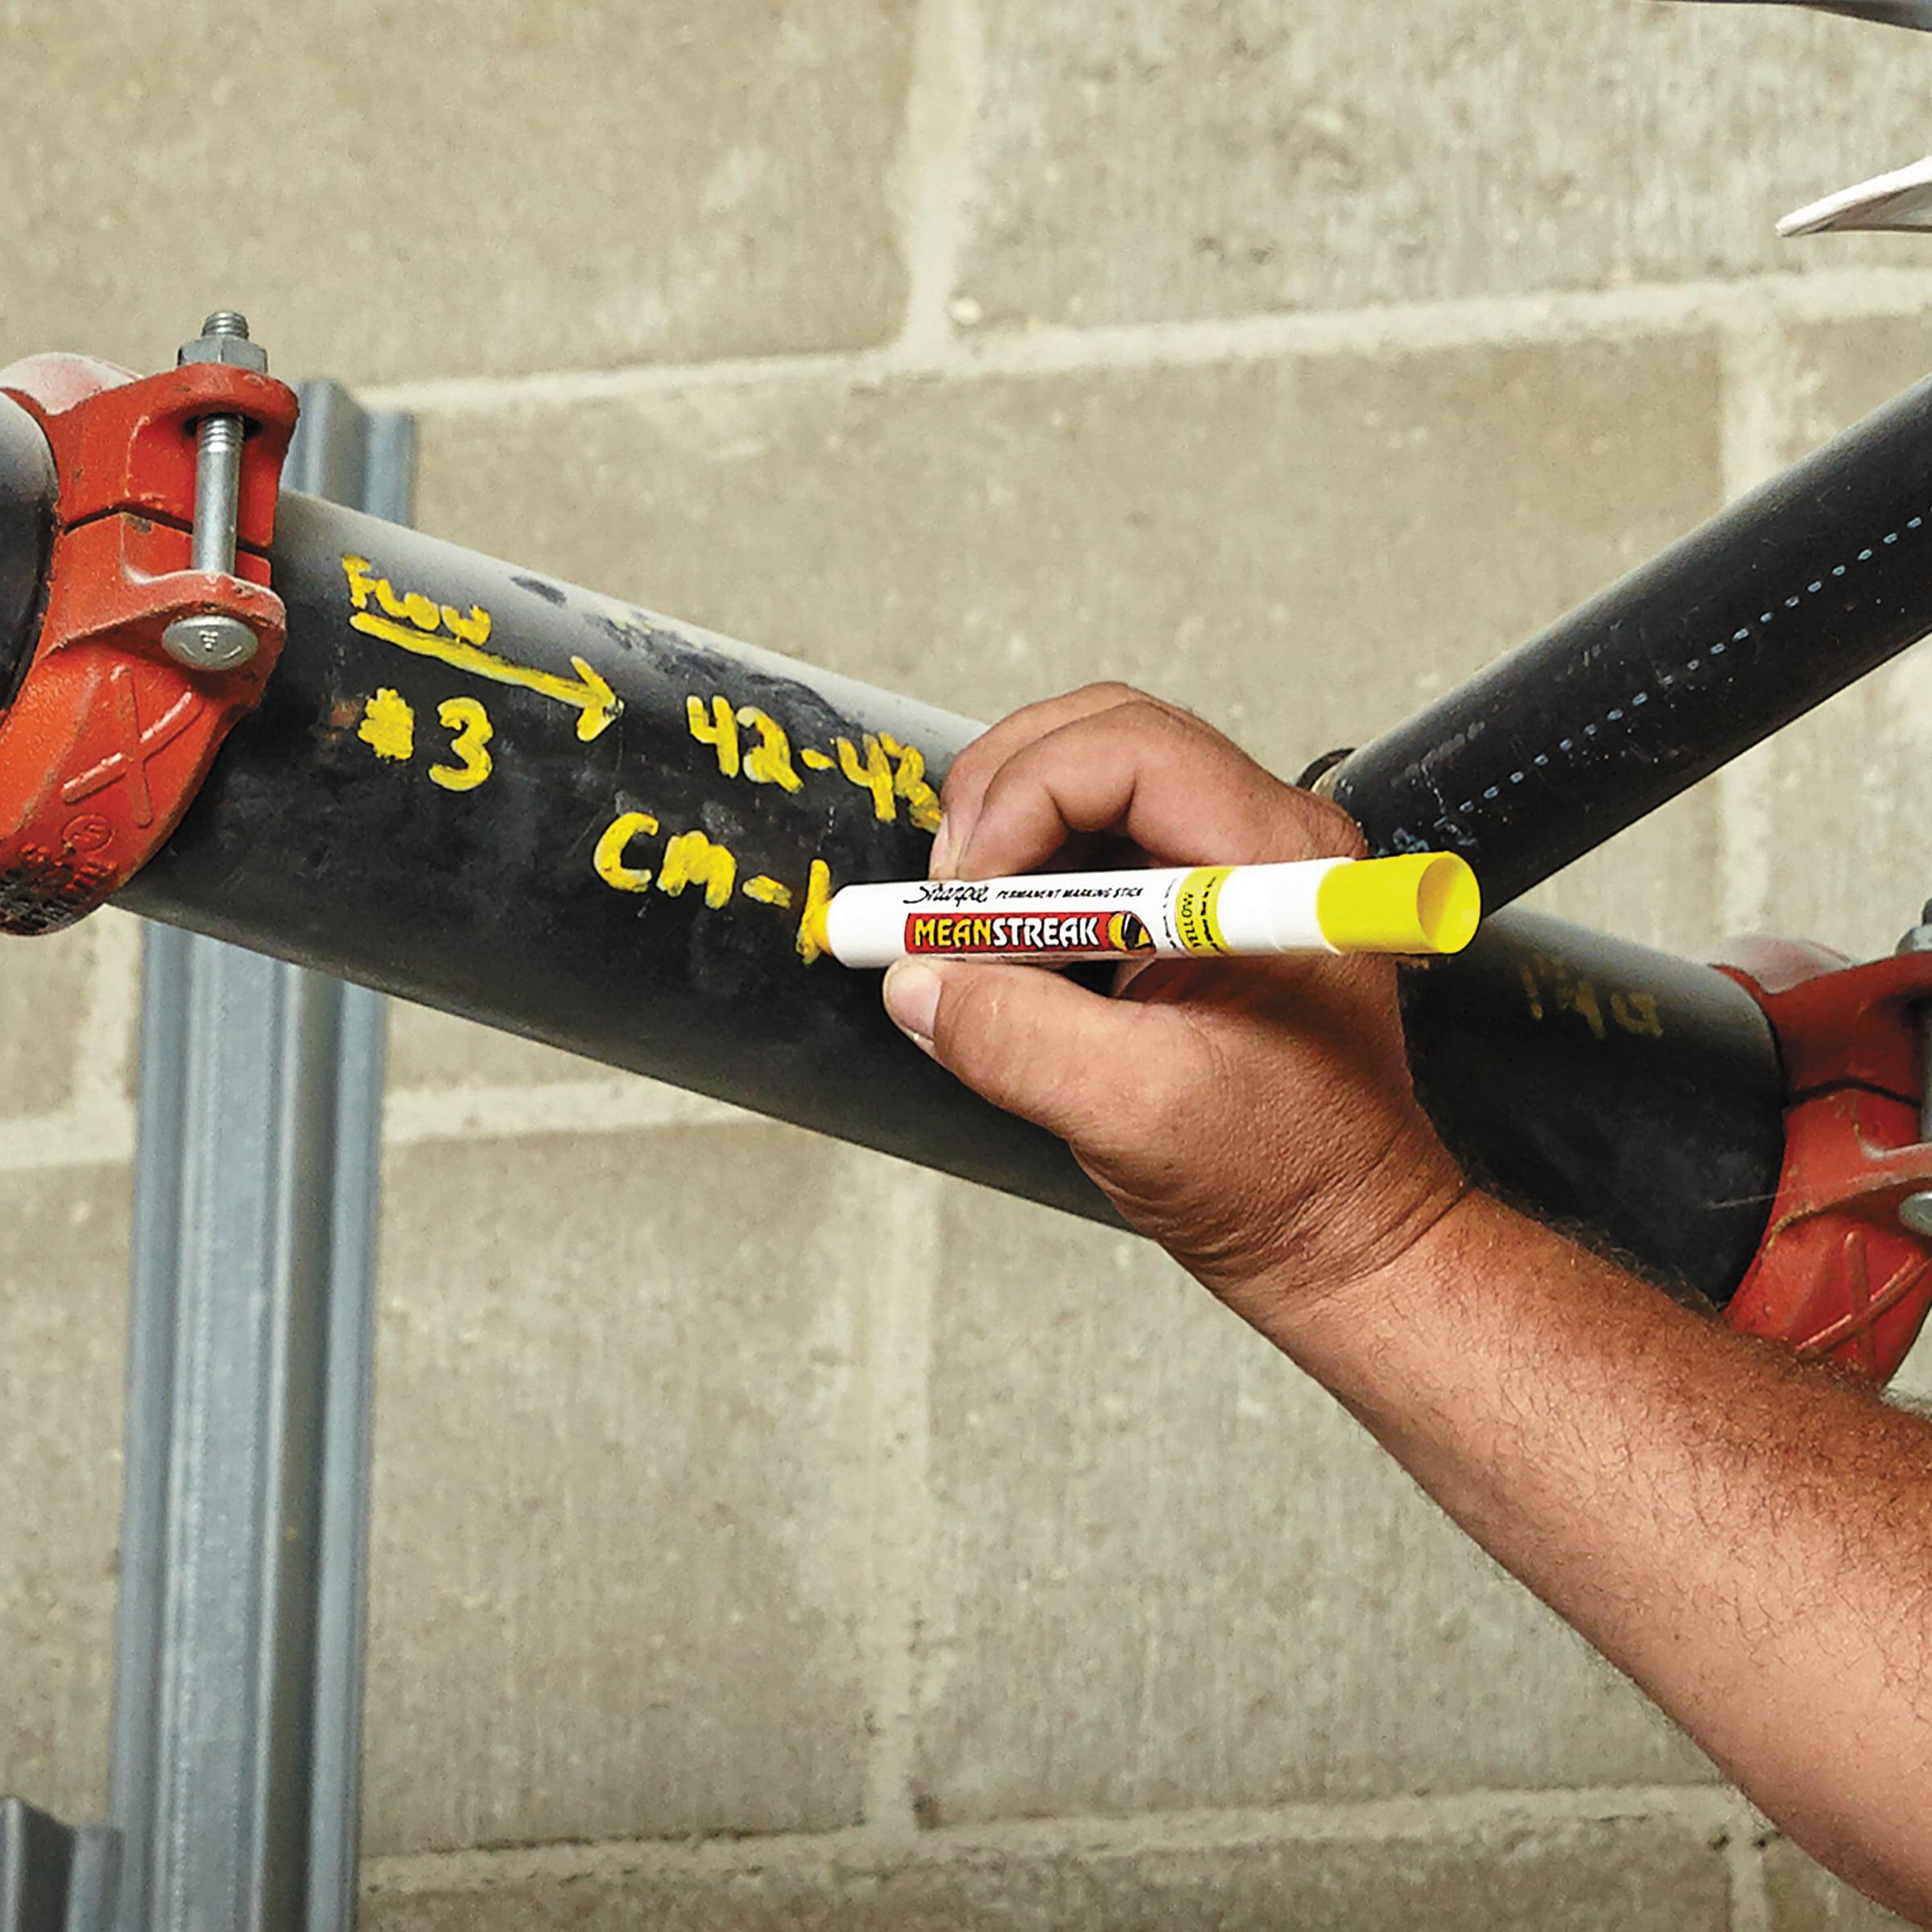 sharpie mean streak marking stick broad tip yellow walmartcom